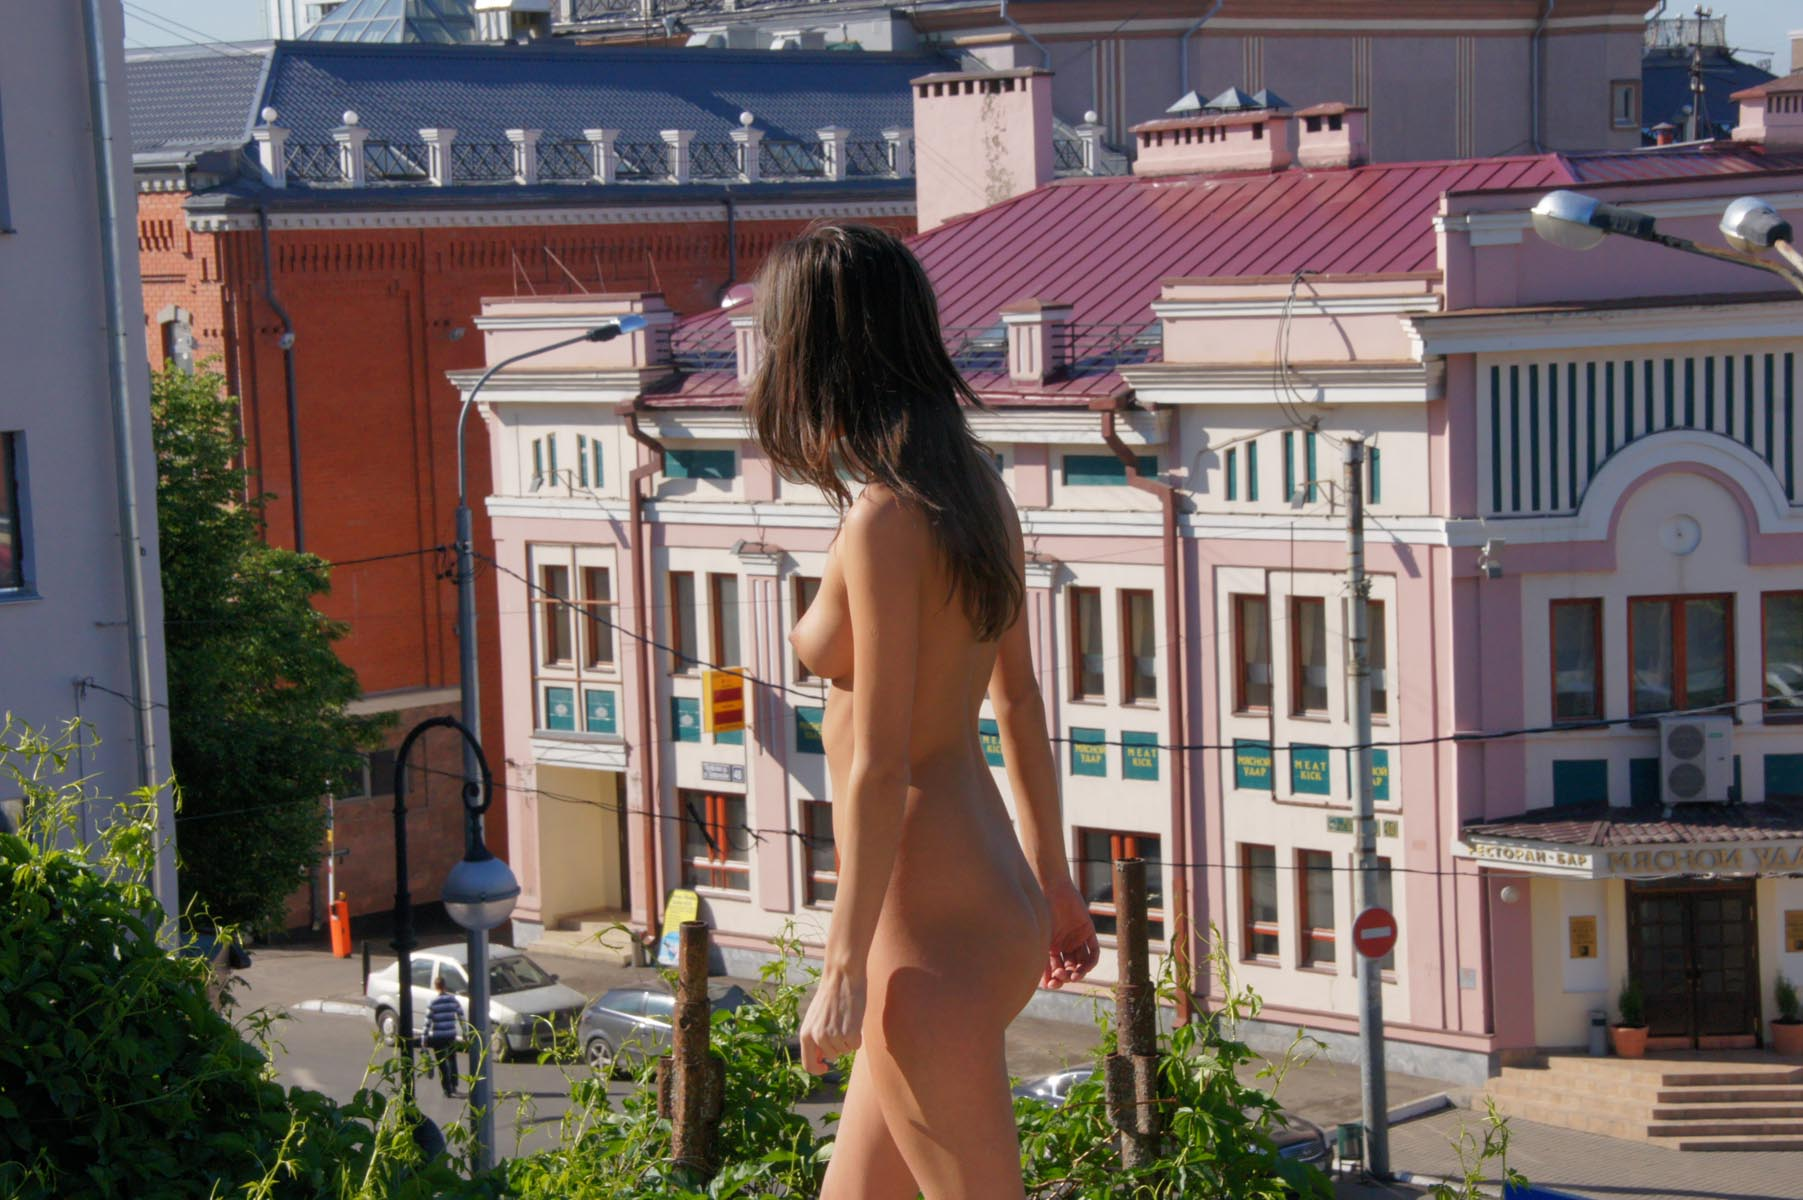 irina-k-naked-in-russia-kazan-nude-public-23